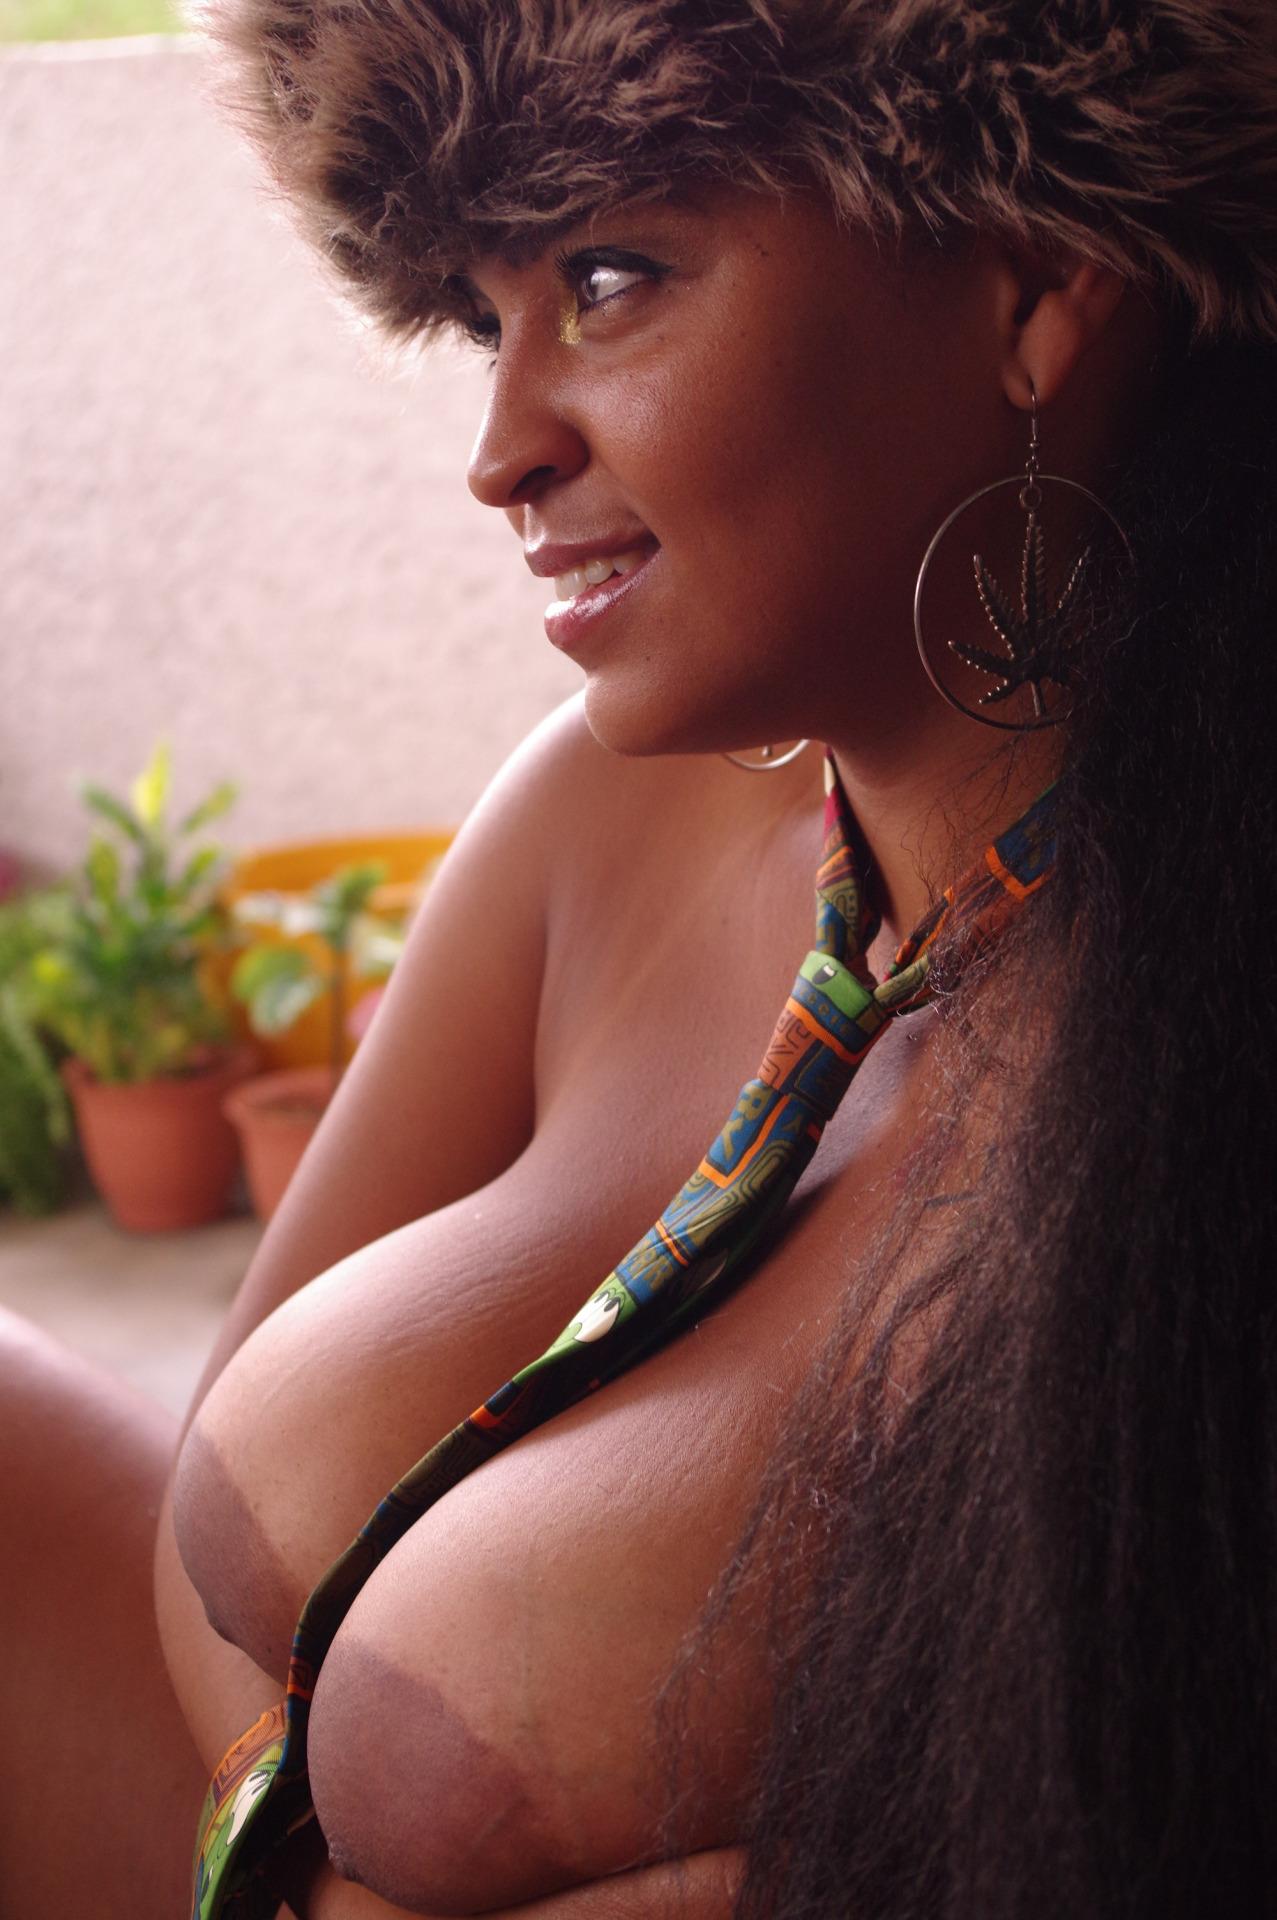 belle femme nue en cam 09